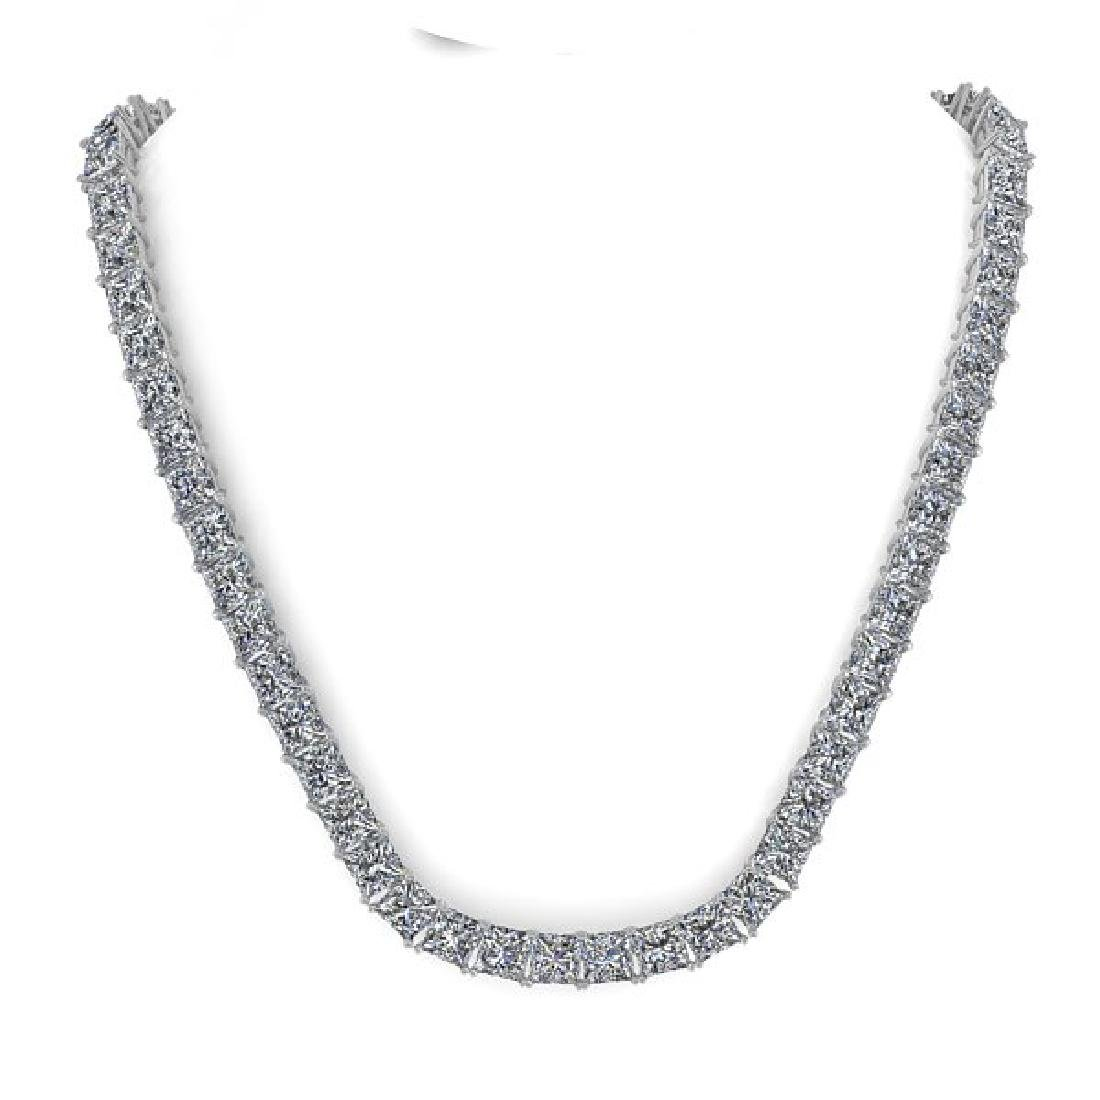 40 CTW Princess Certified SI Diamond Necklace 18K Rose - 3